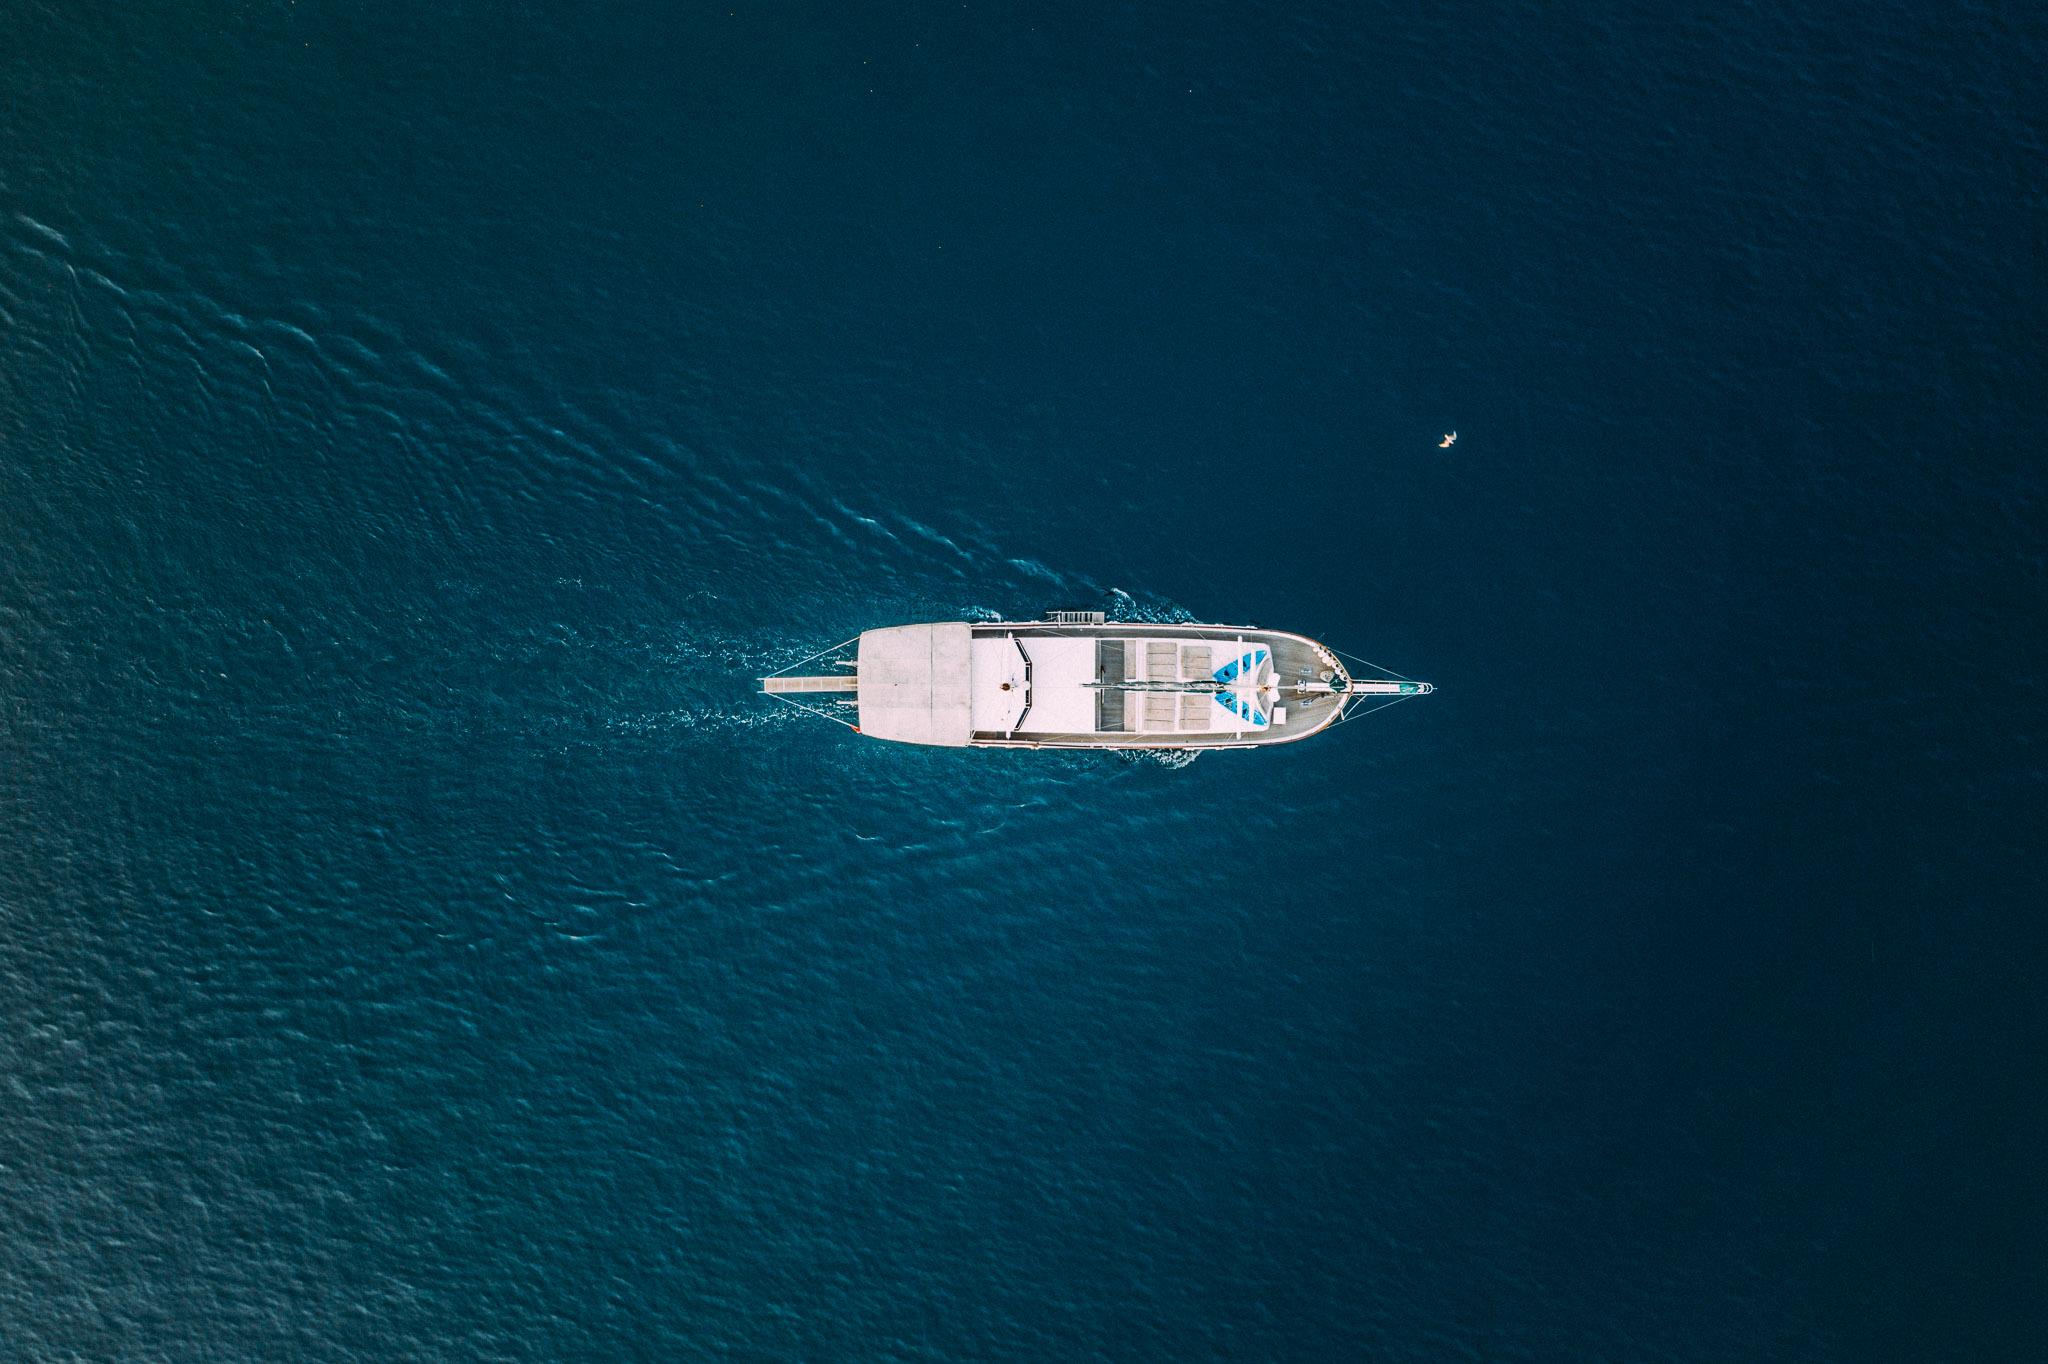 PJ Rankin_Drop in the Ocean_Montenegro-40.jpg